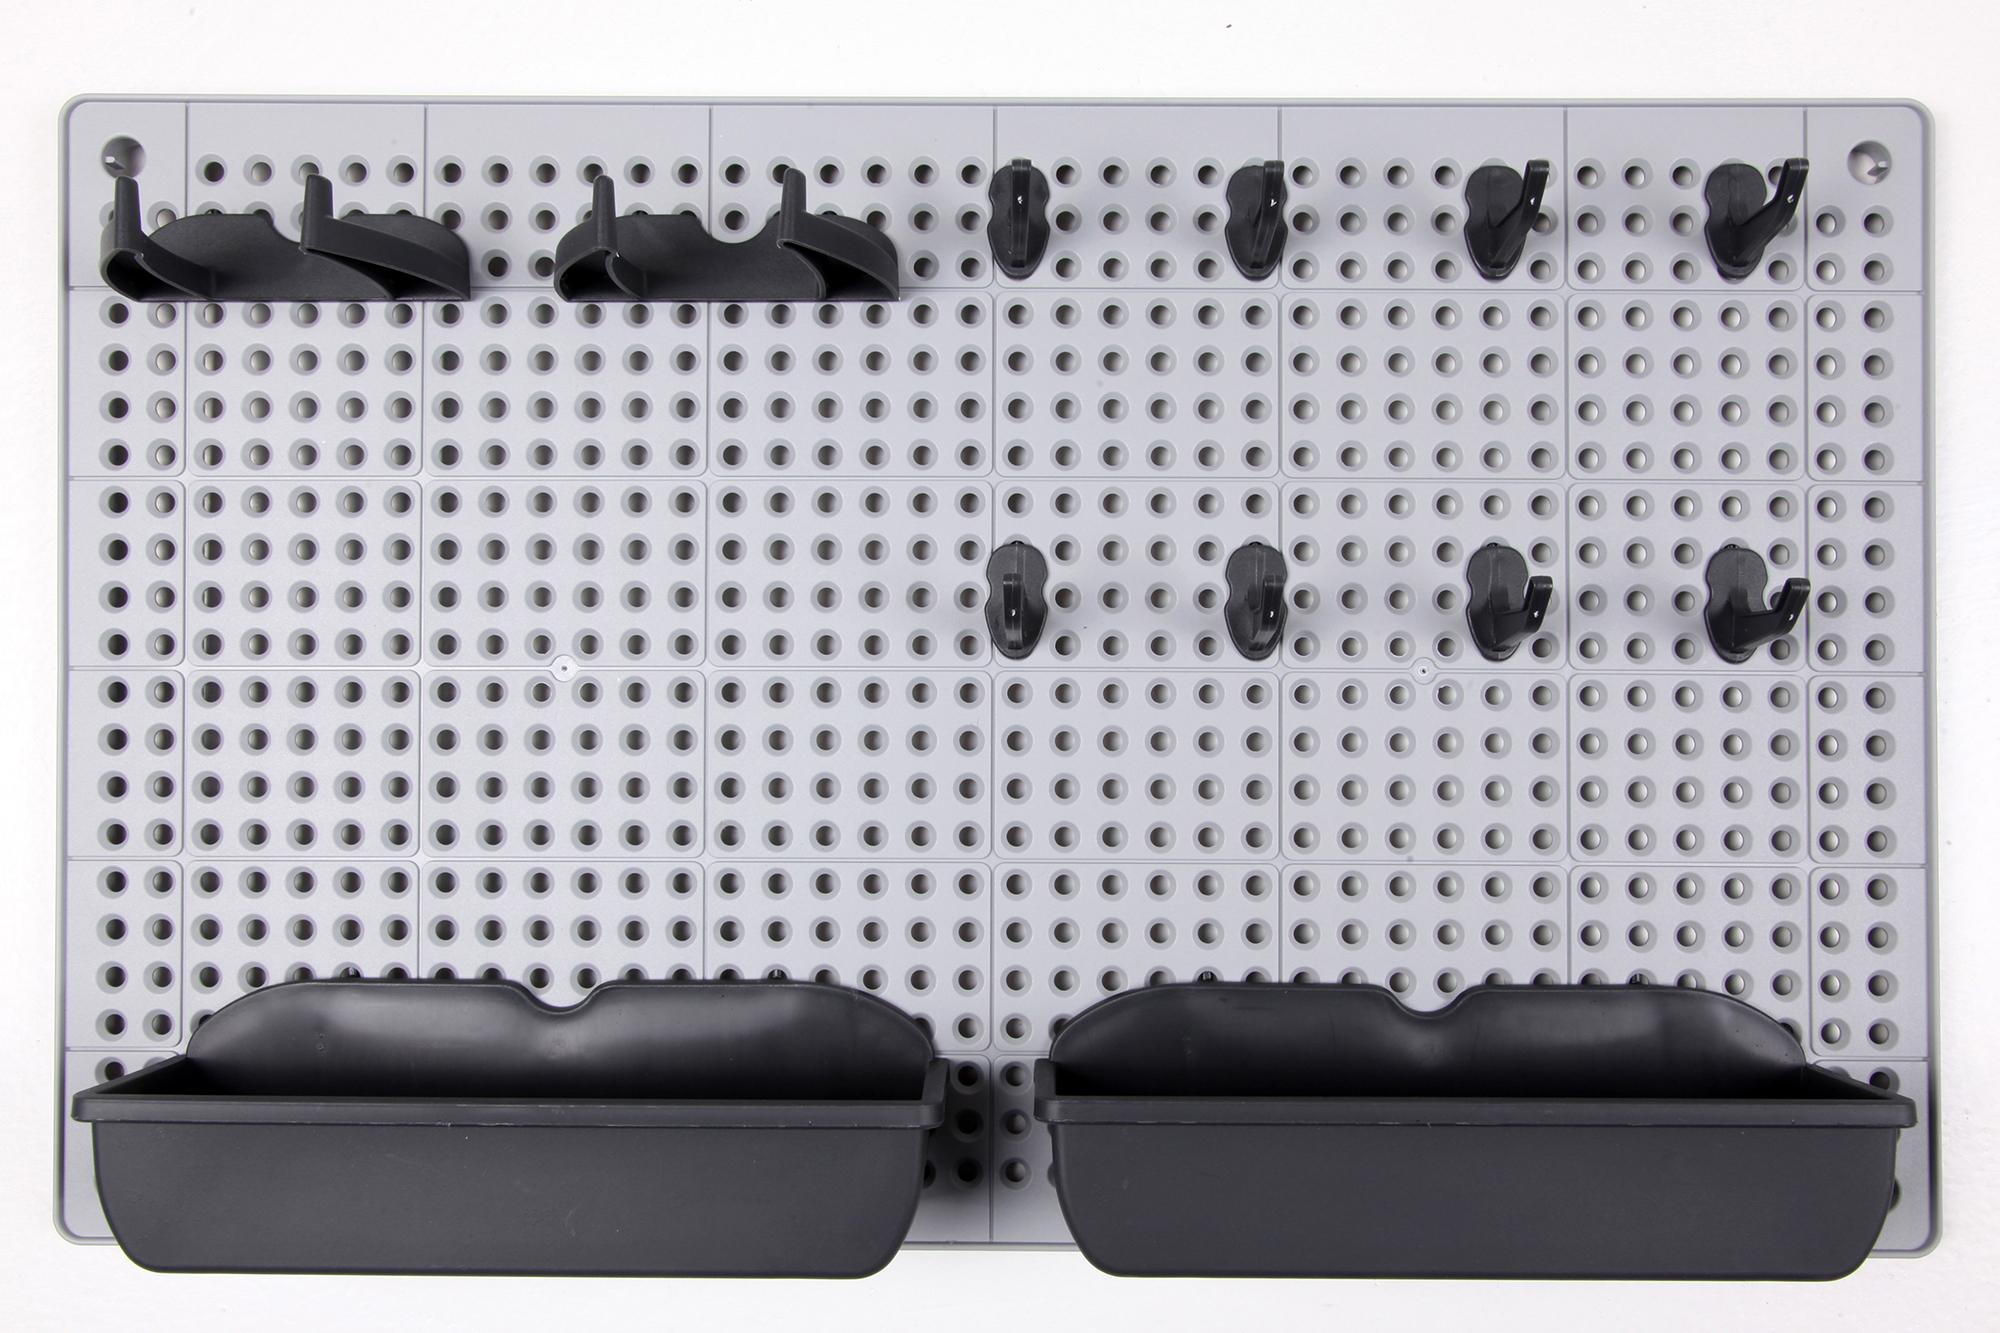 ondis24 lochwand kunststoff mit haken g nstig online kaufen. Black Bedroom Furniture Sets. Home Design Ideas